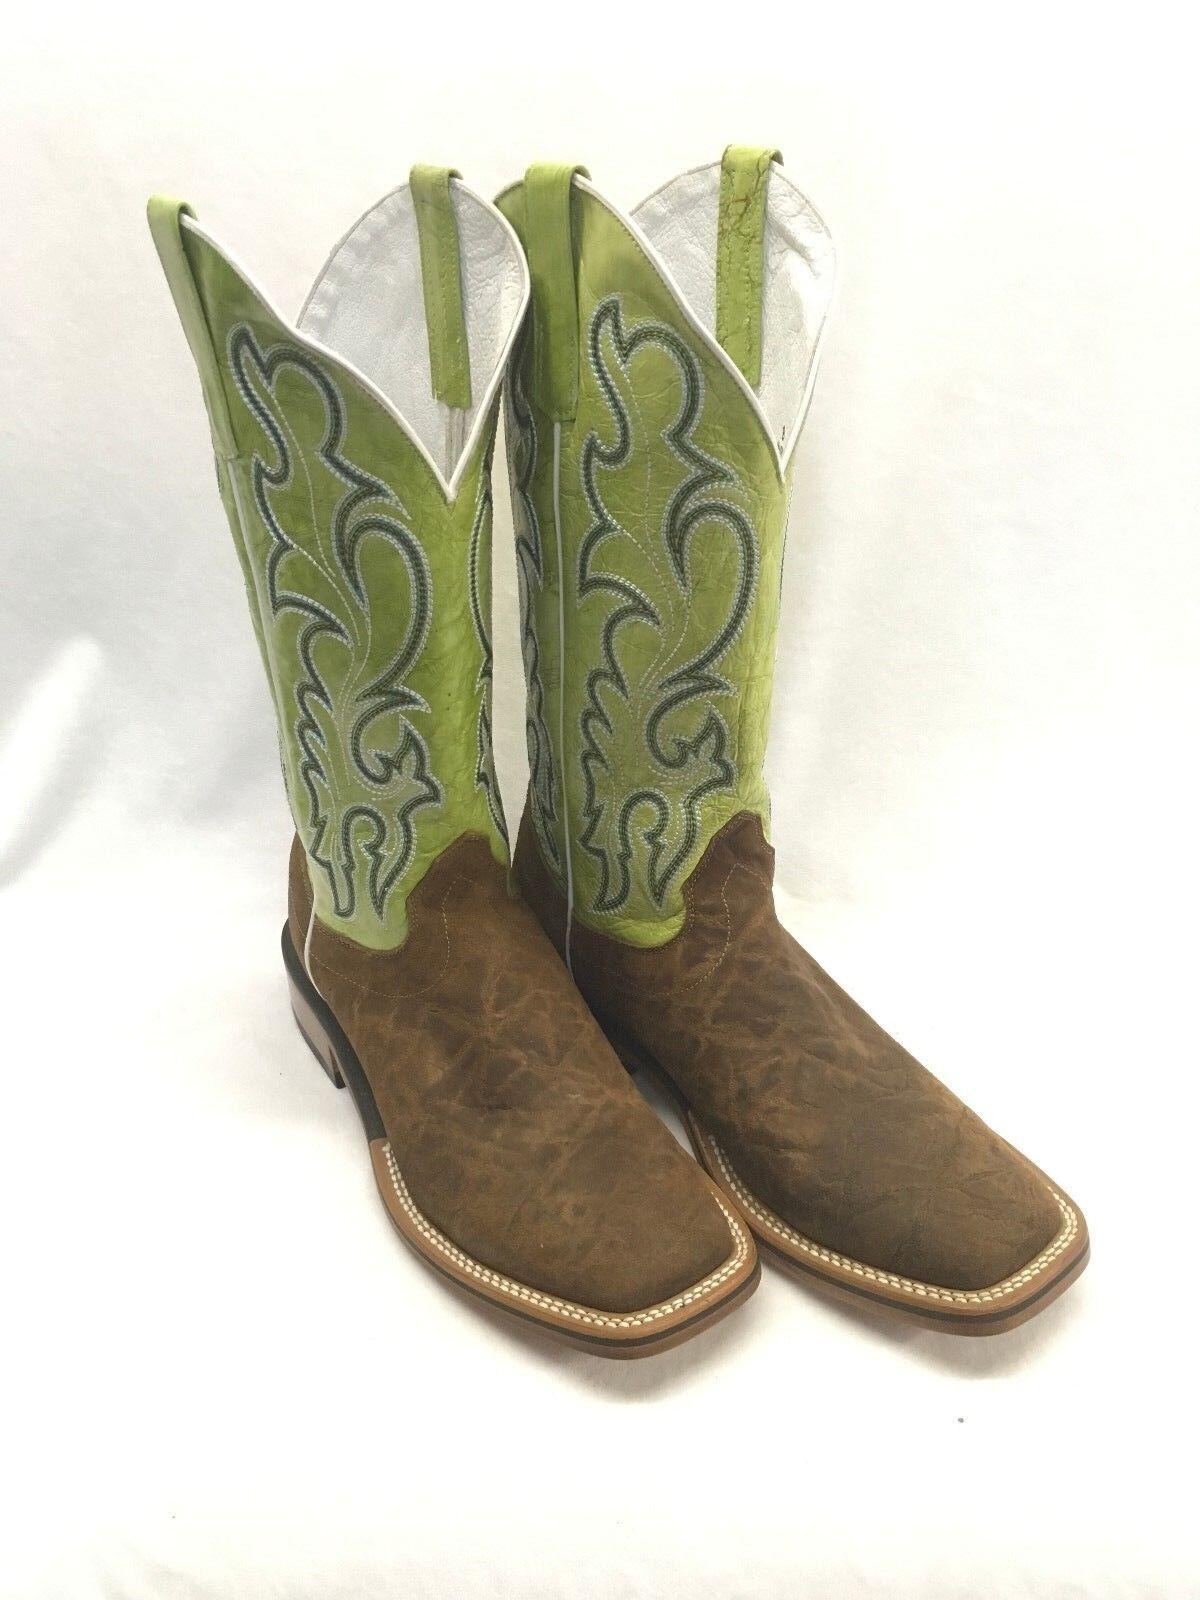 botas para hombre Olathe Cowboy Collection, Puntera Cuadrada Marrón Con Eje verde Lima CC65